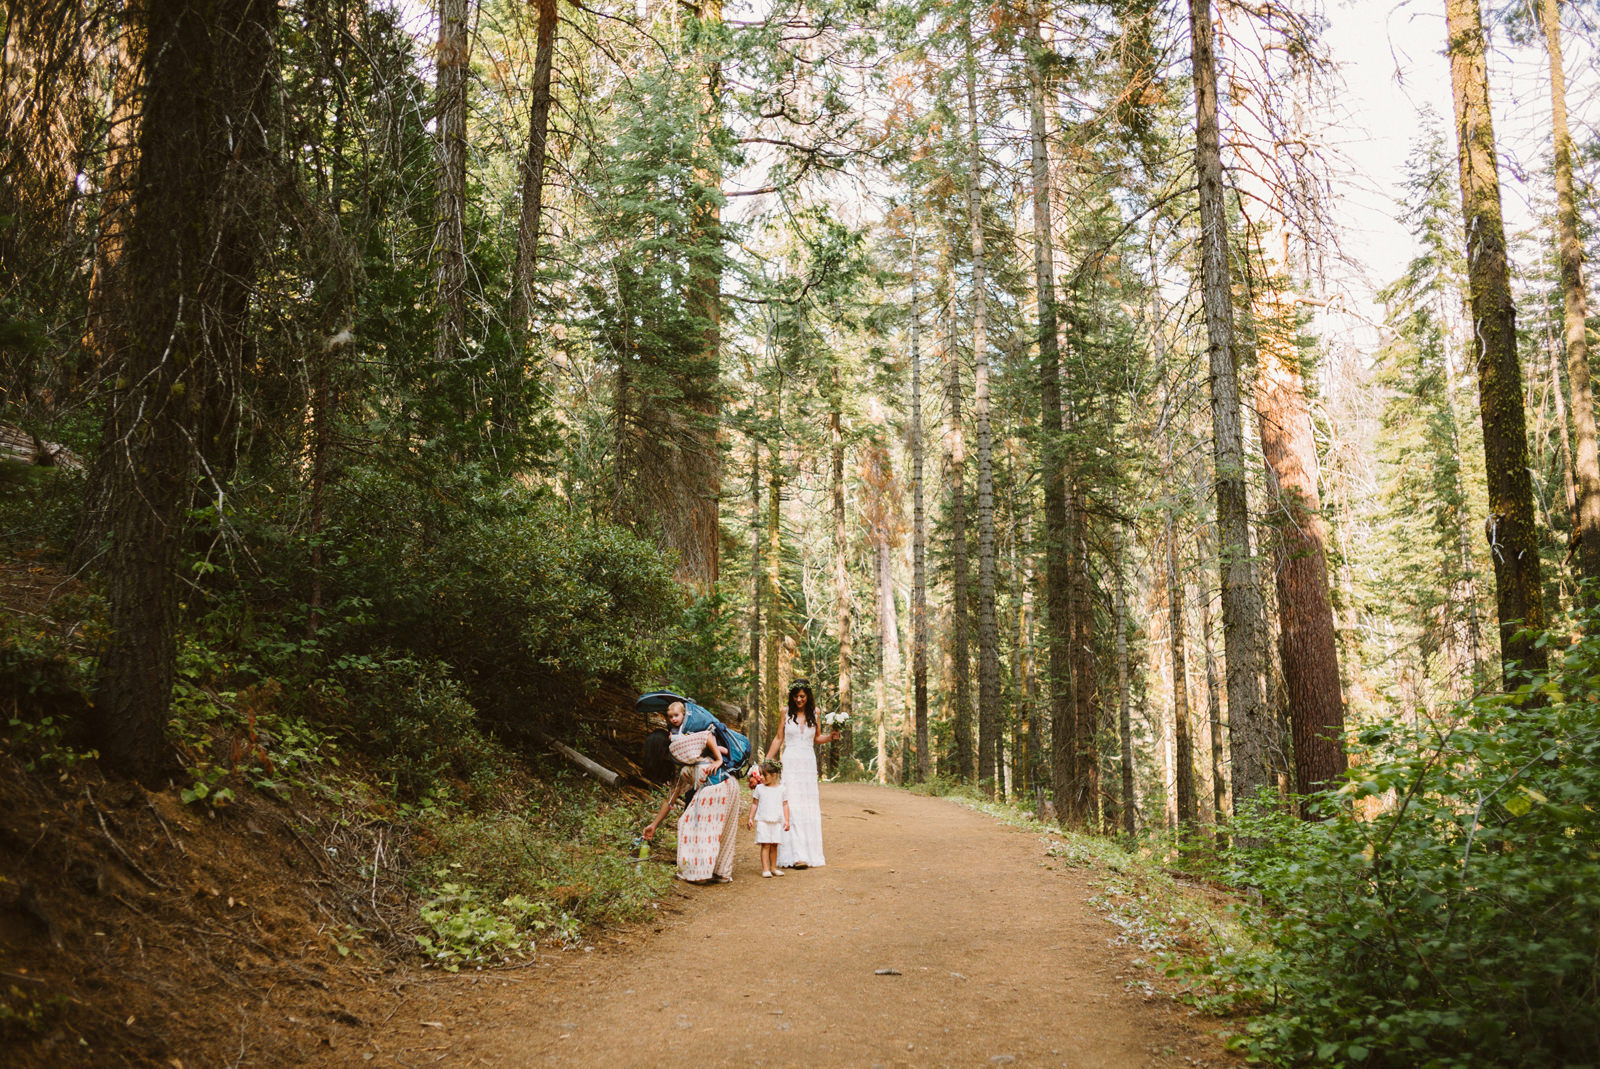 yosemite-intimate-wedding-037 YOSEMITE INTIMATE WEDDING